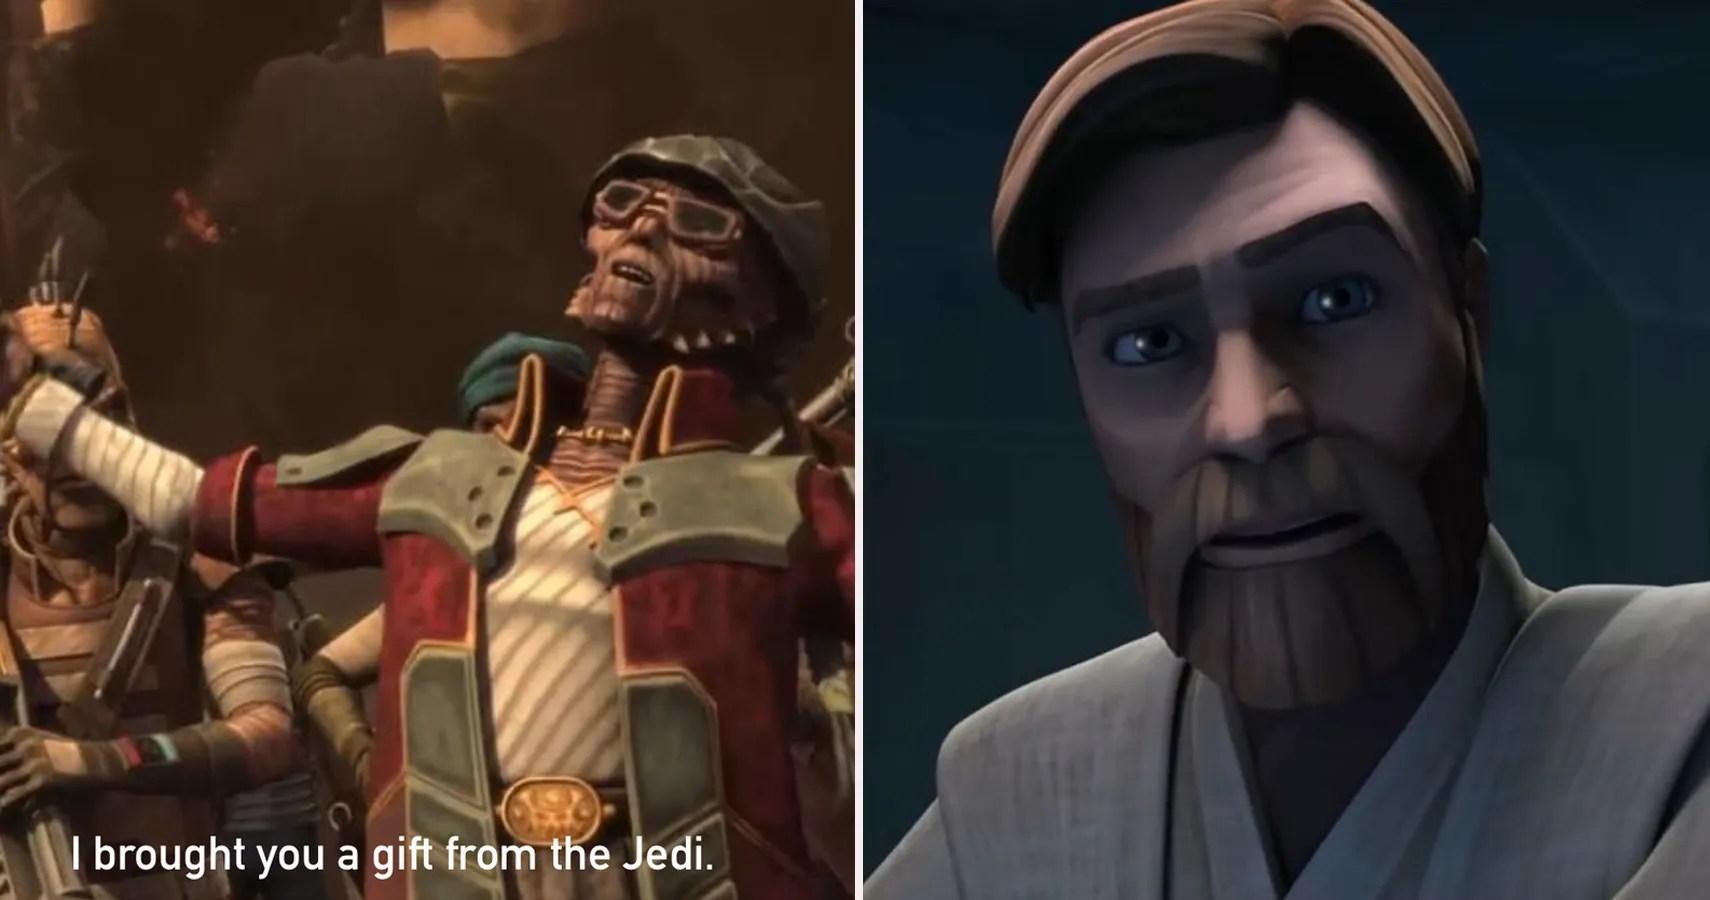 Clone Wars Season 7 10 Hilarious Memes Only True Fans Will Understand